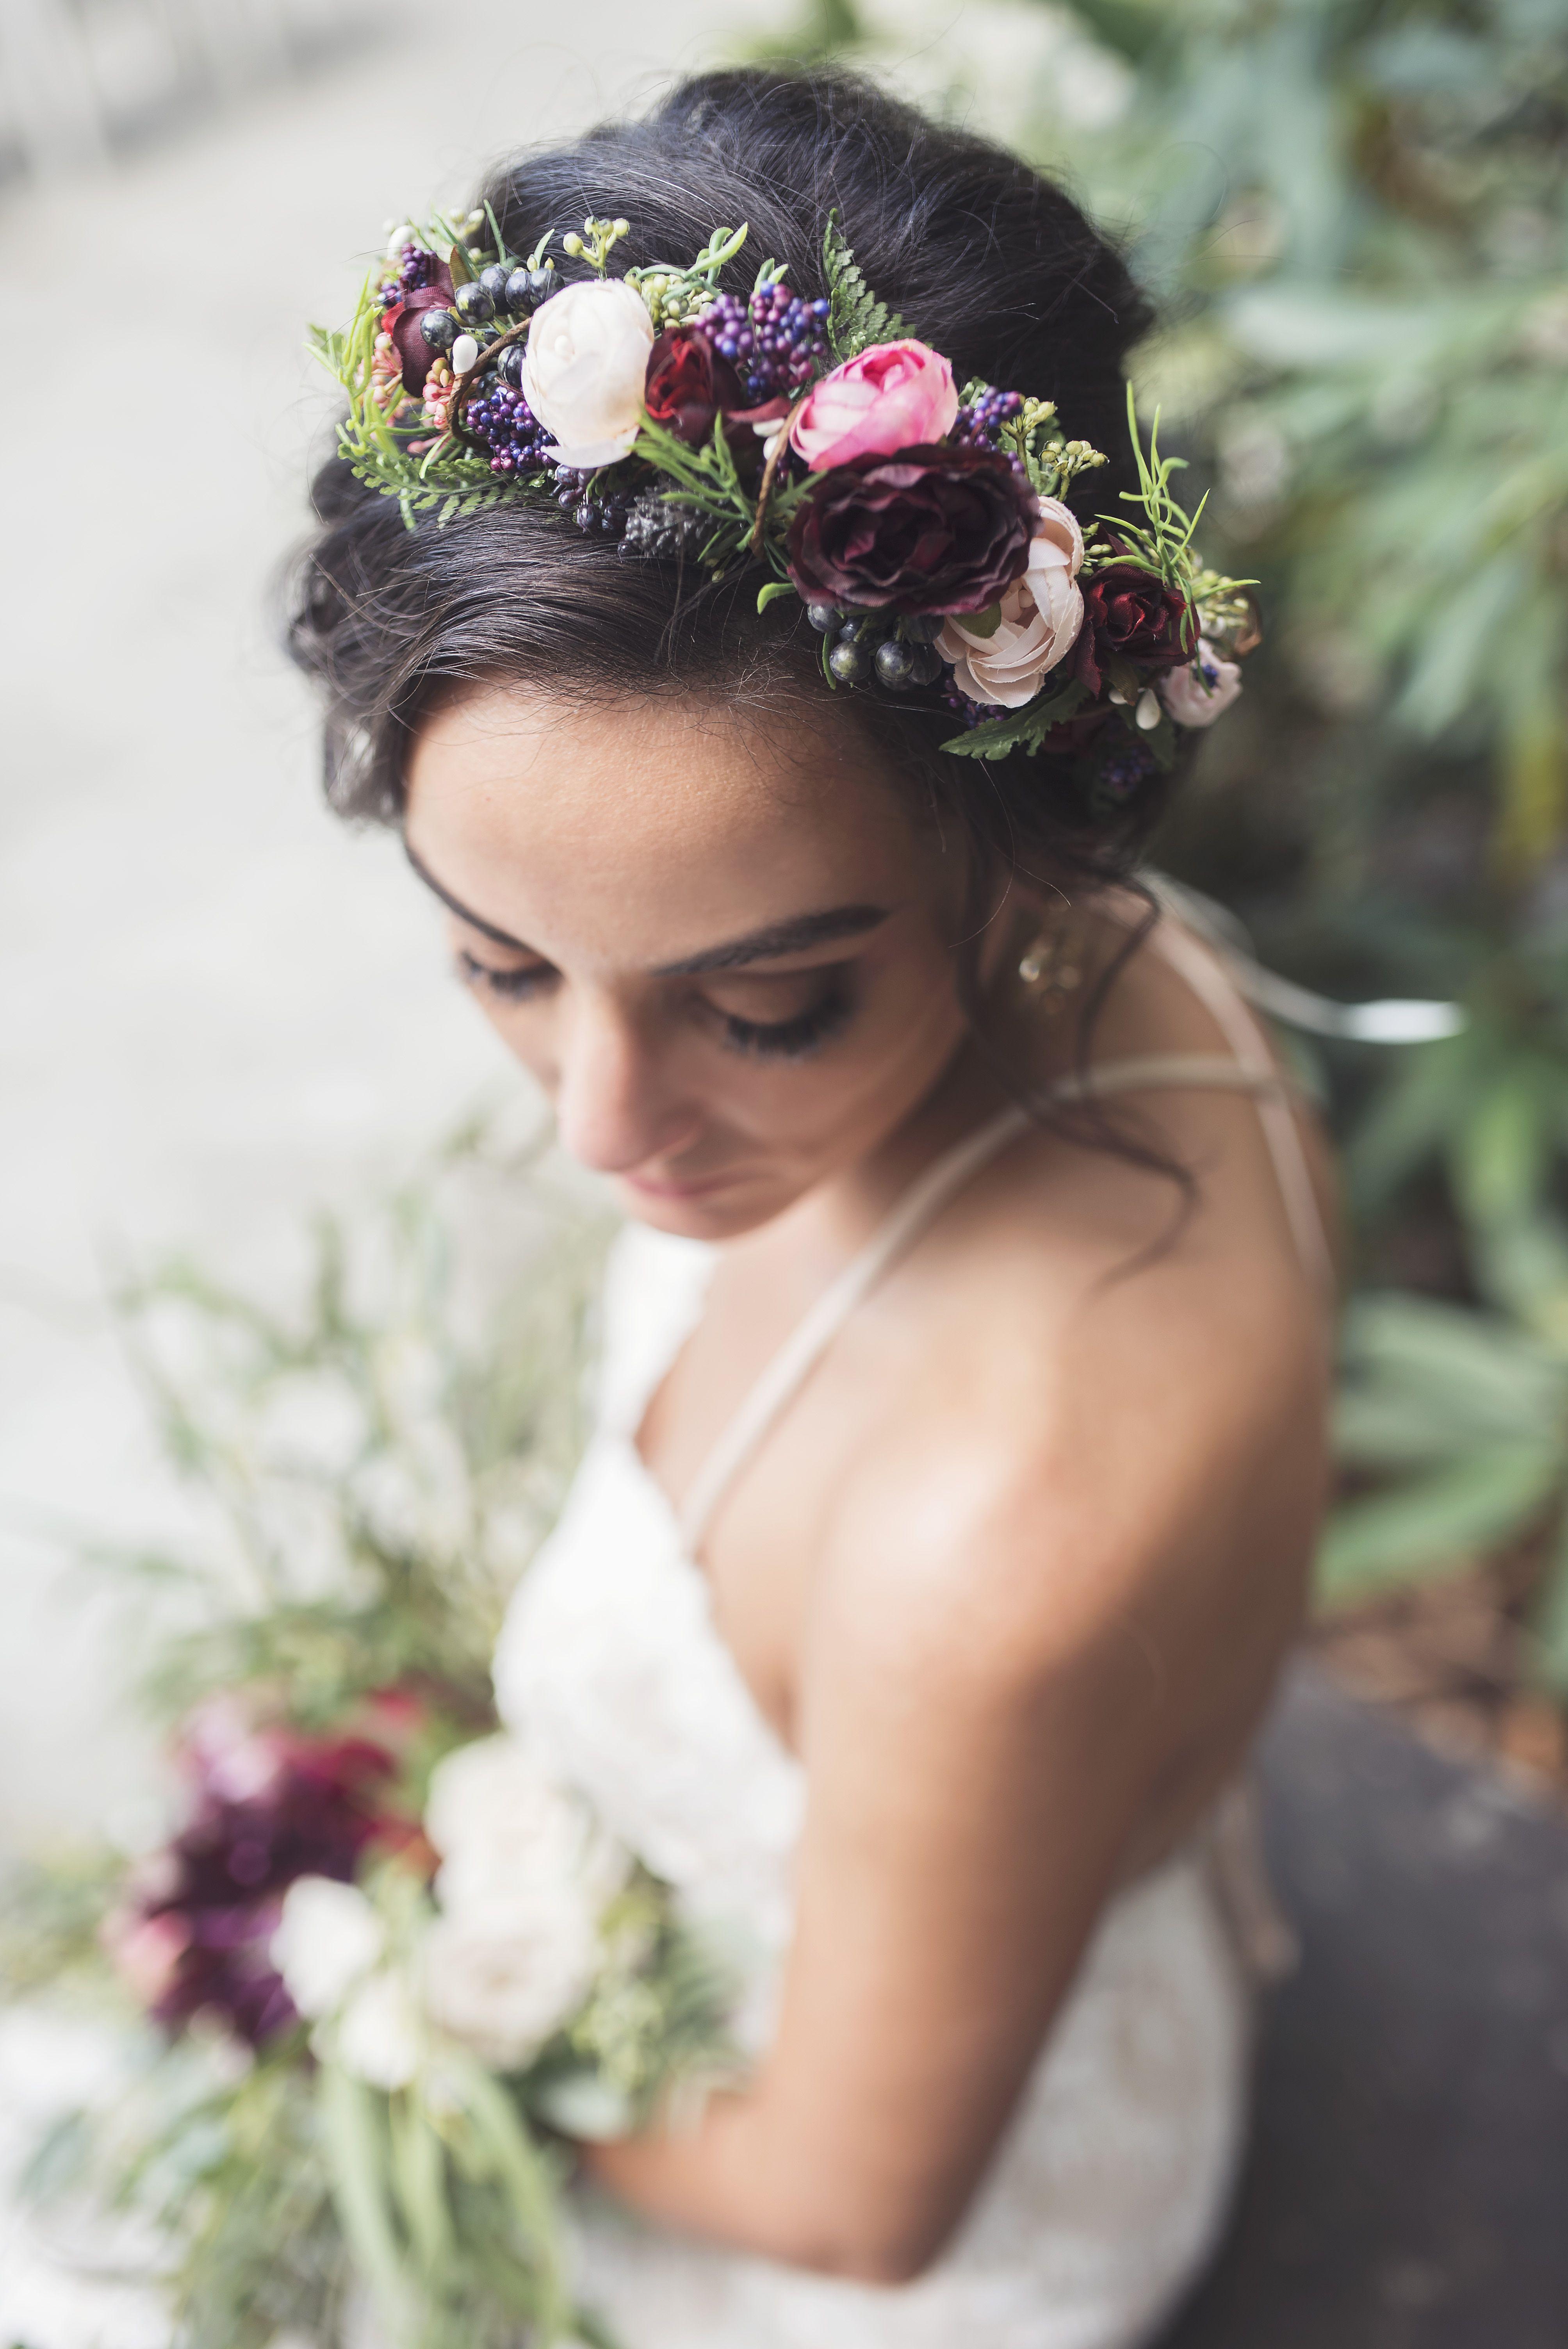 Boho wedding flower crown wedding photography pinterest boho boho wedding flower crown izmirmasajfo Images